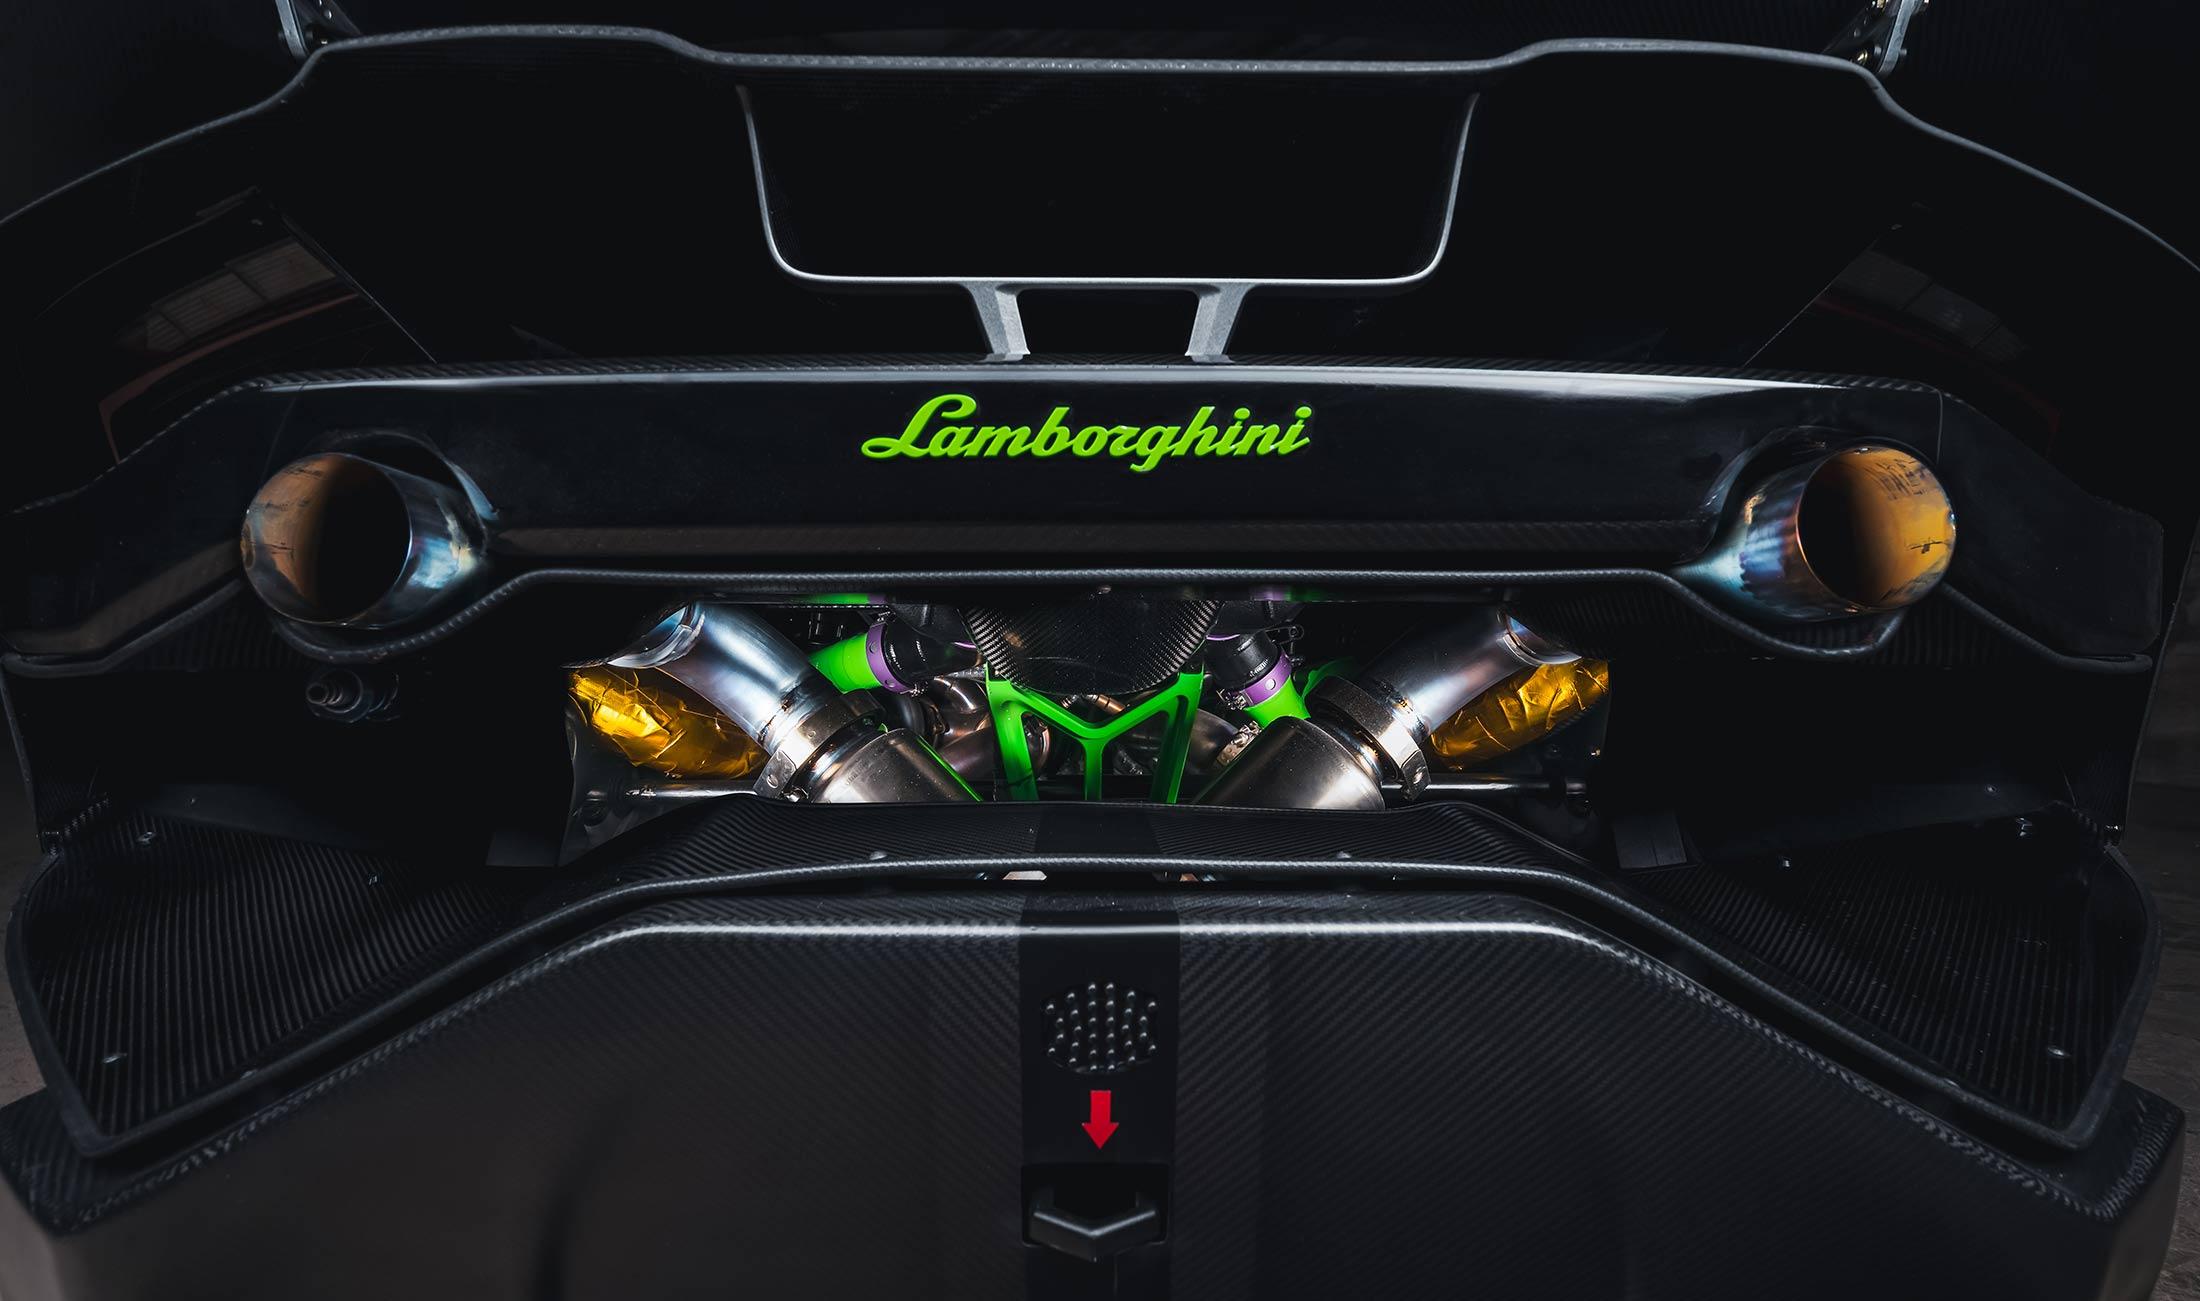 Zyrus LP1200 - 2020 - rear view - under the hood - V10 5.2L Twin Turbo - exhaust titanium